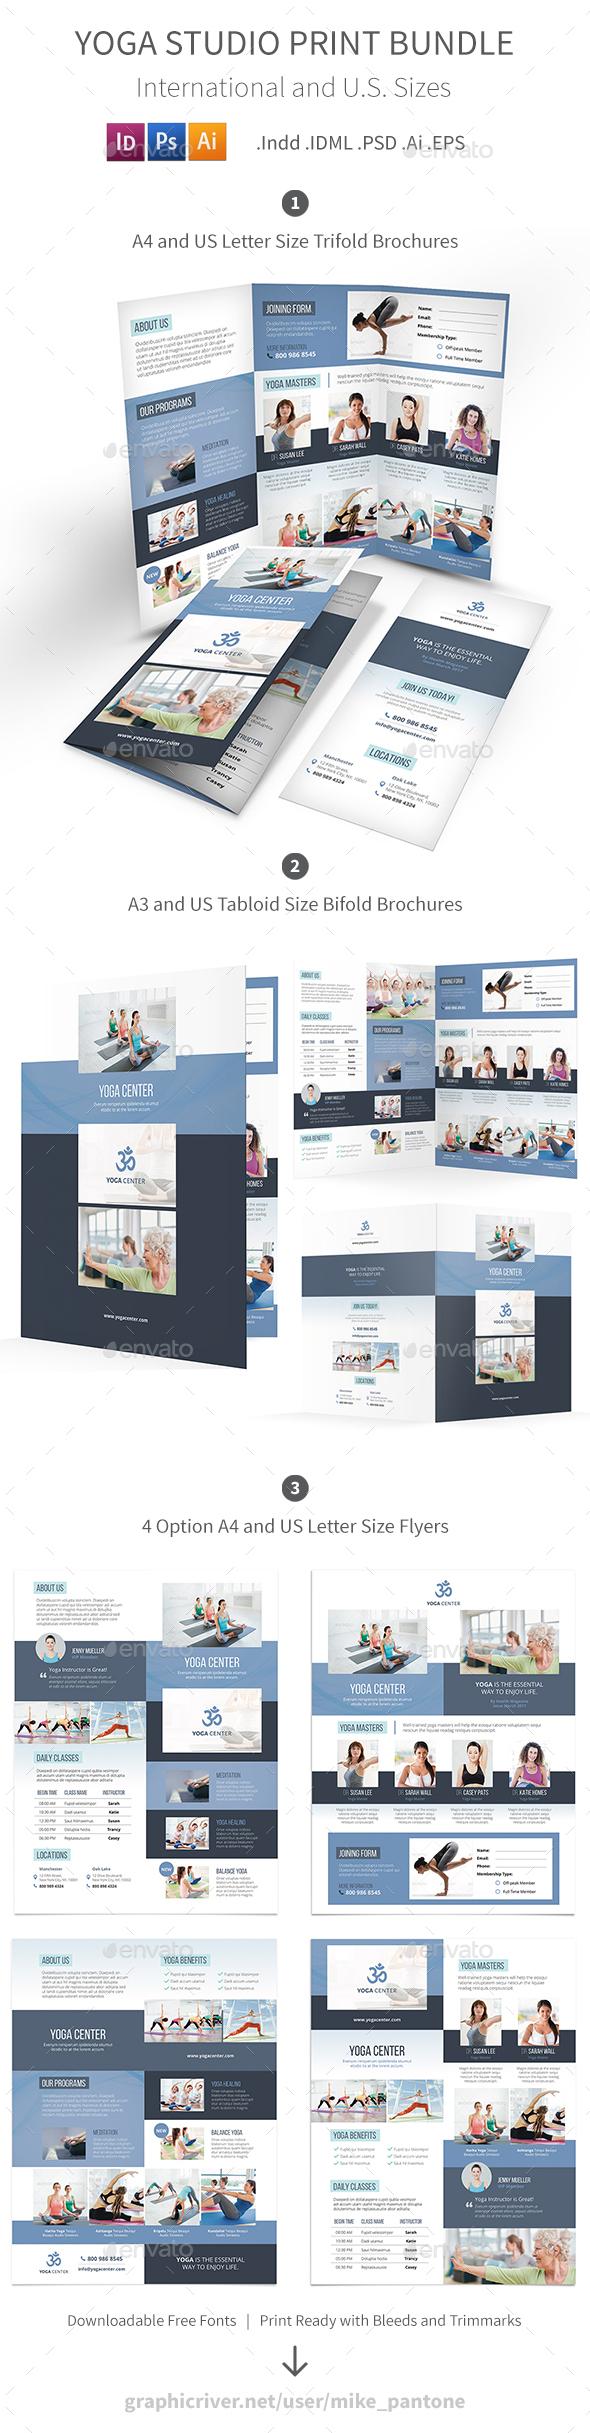 Yoga Studio Print Bundle - Informational Brochures